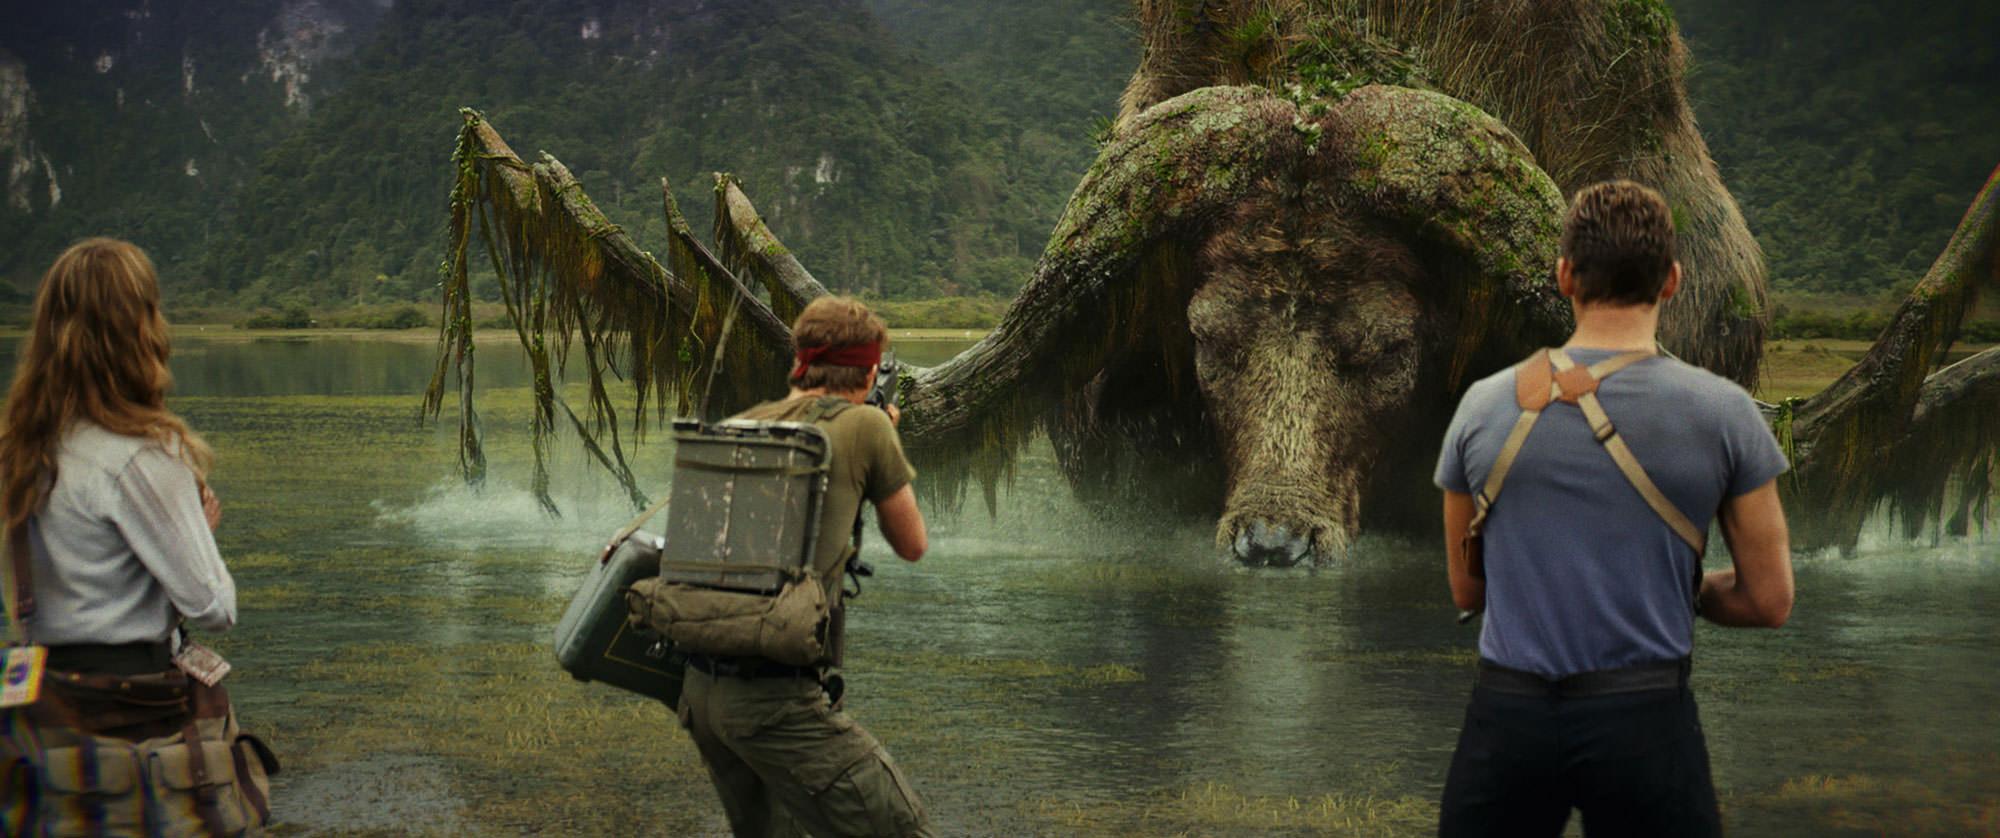 Kong Skull Island Stream Hd Filme